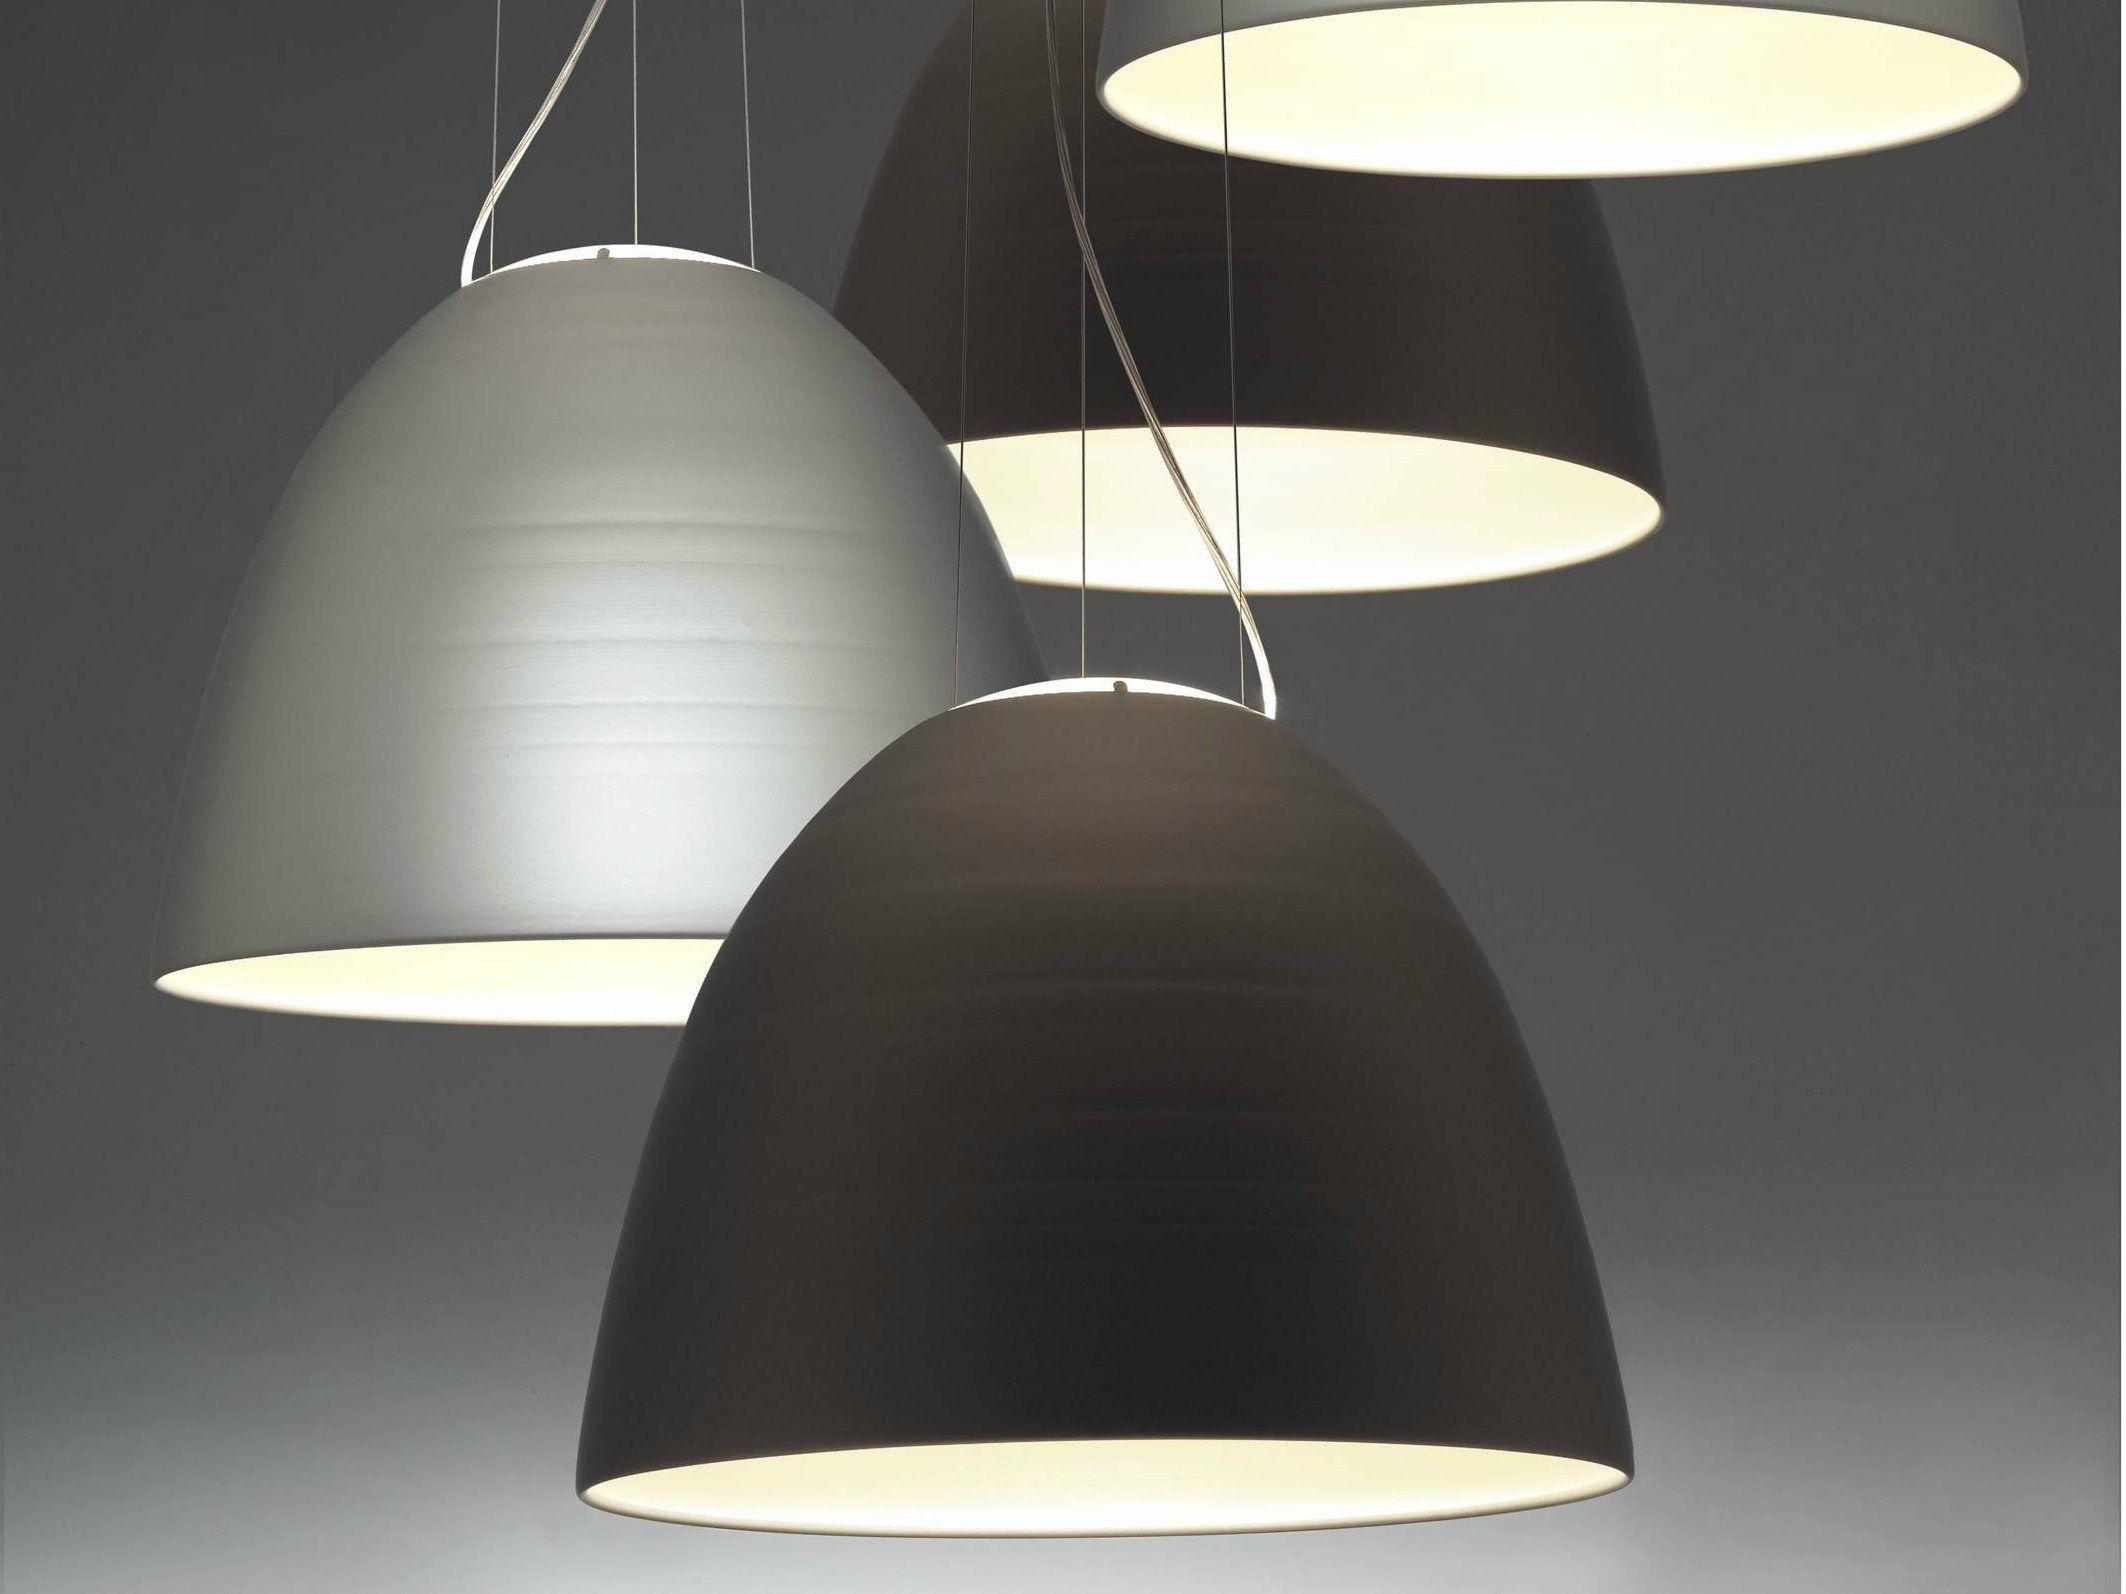 Nur pendant lamp nur collection by artemide design ernesto gismondi - Lampadari di design sospensione ...